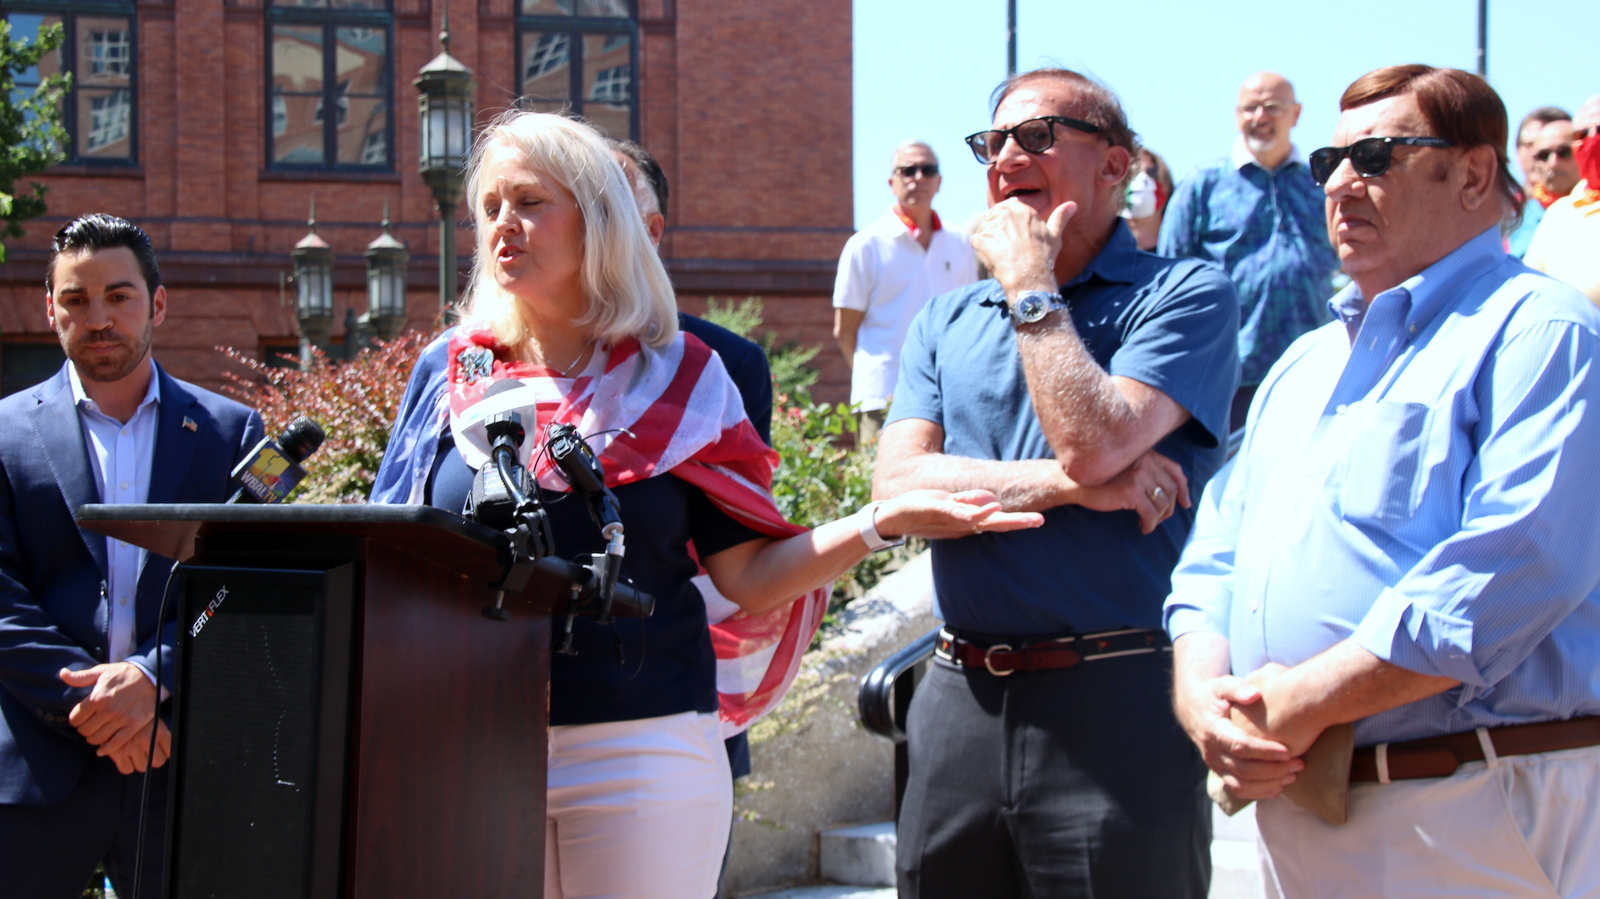 Nino Mangione, Kathy Szeliga, John Pica and Pat McDonough at the Columbus statue in Baltimore. (Louis Krauss)